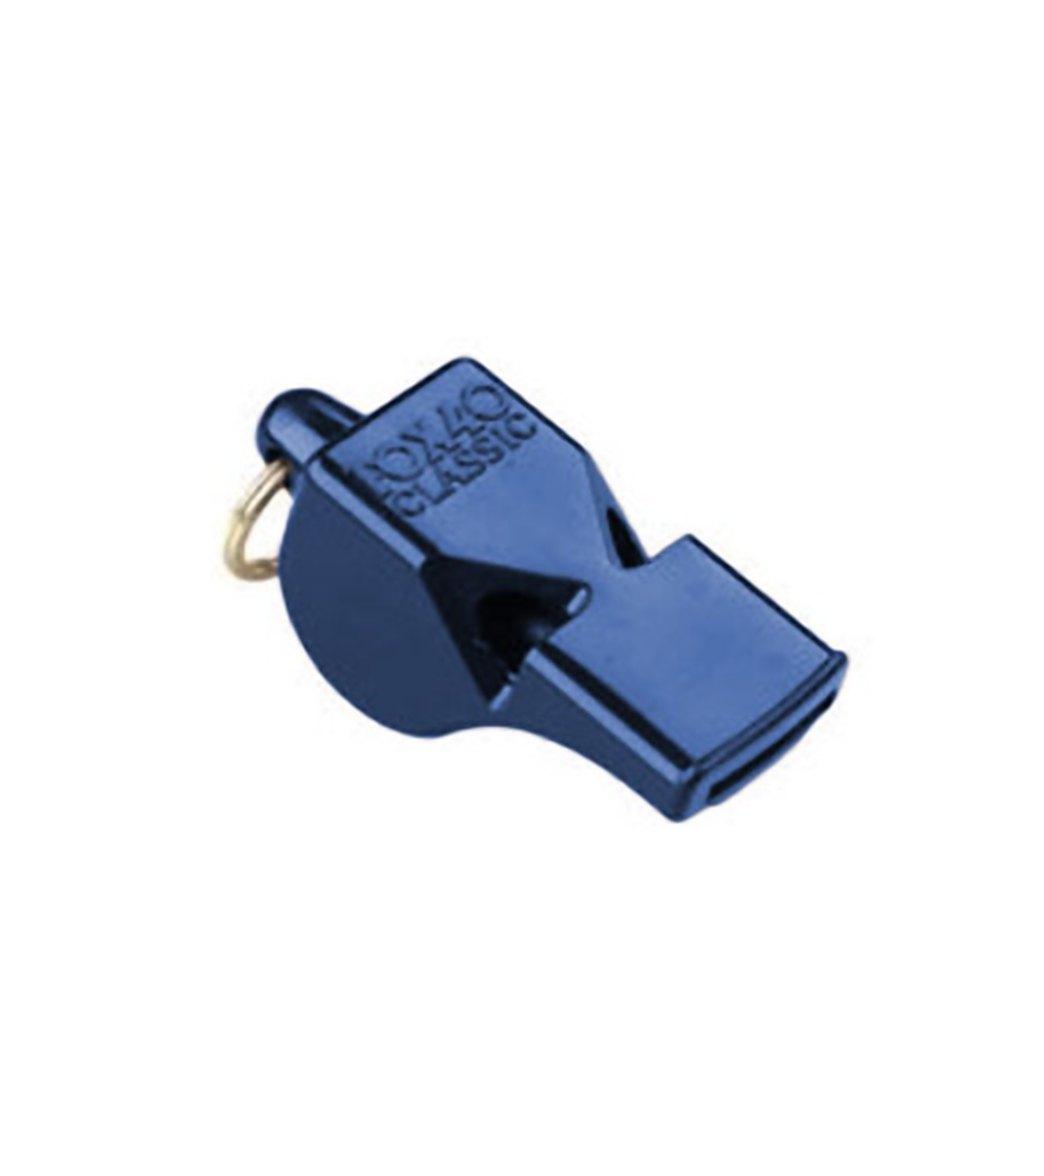 d98942117eac Fox40 Lifeguard Whistle at SwimOutlet.com